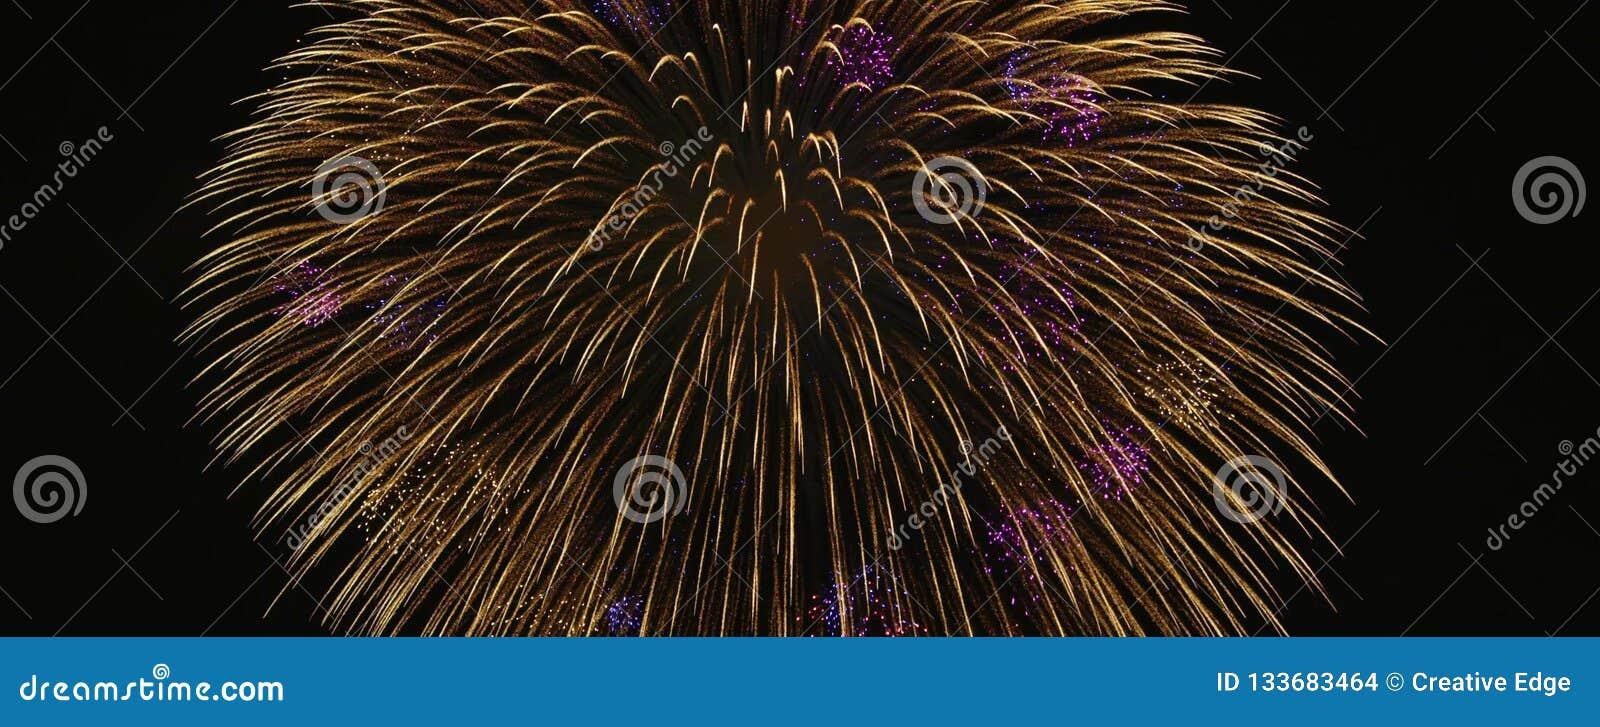 Japanese Superb view fireworks